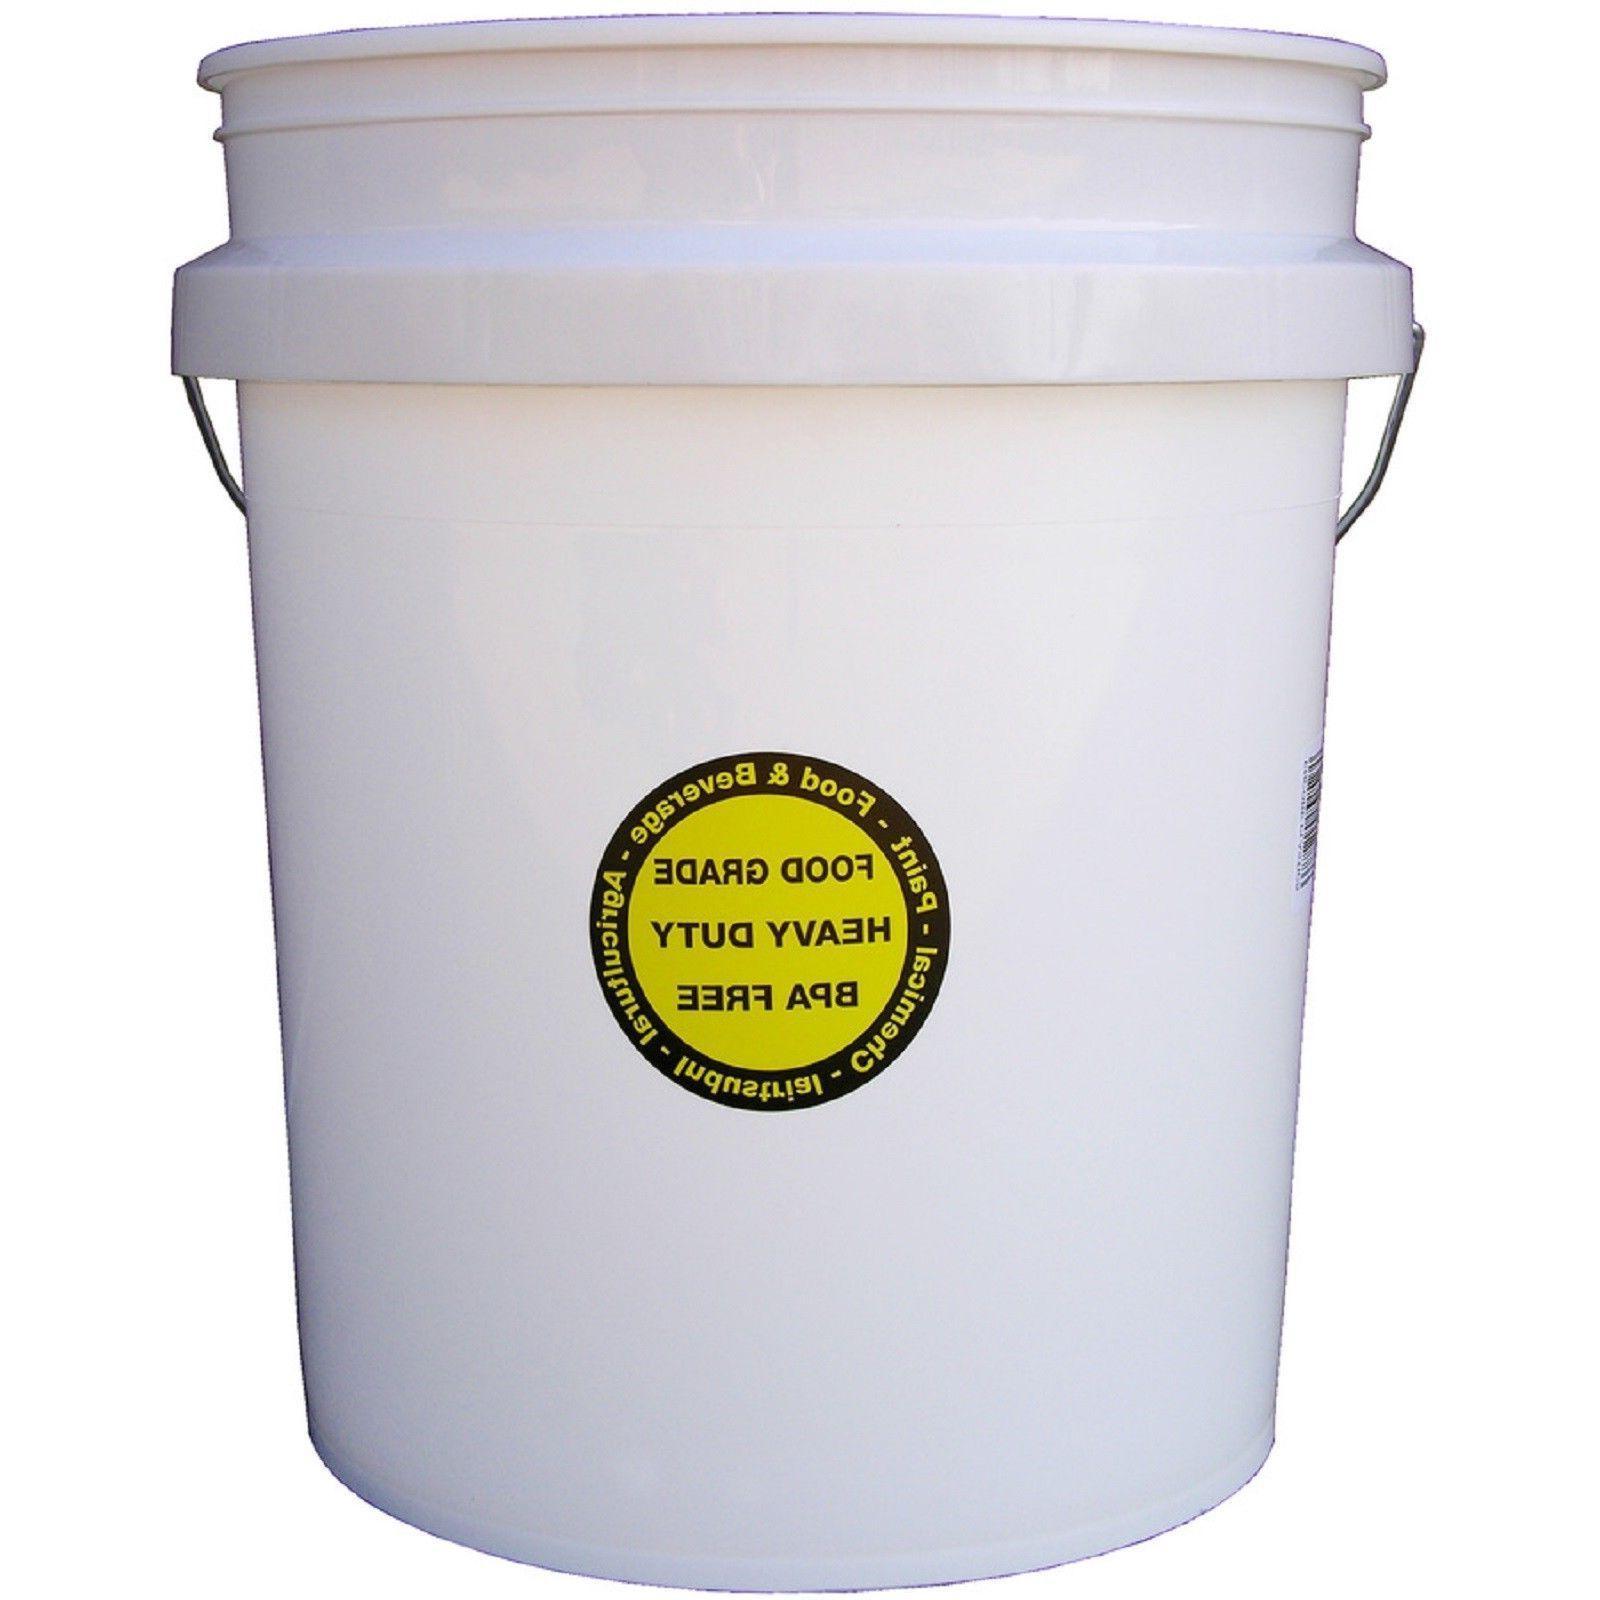 5 Gallon Bucket Lid Commercial Food Durable Pail